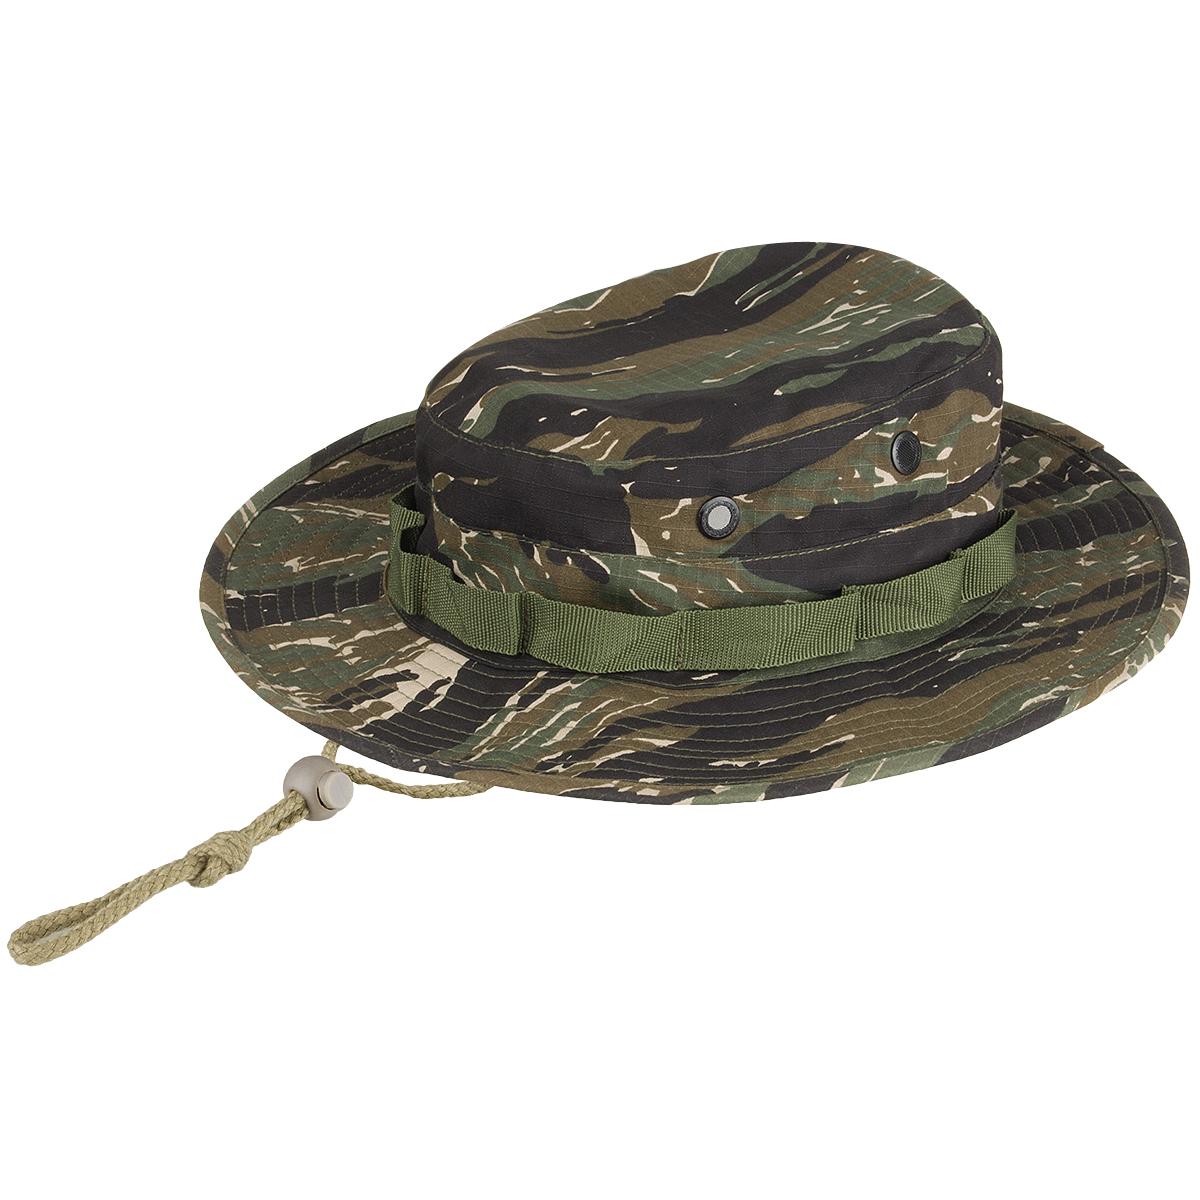 Details about Vietnam Army Style Boonie Bush Camouflage Jungle Sun Hat Cap  Tiger Stripe Camo 9b832ae20cd